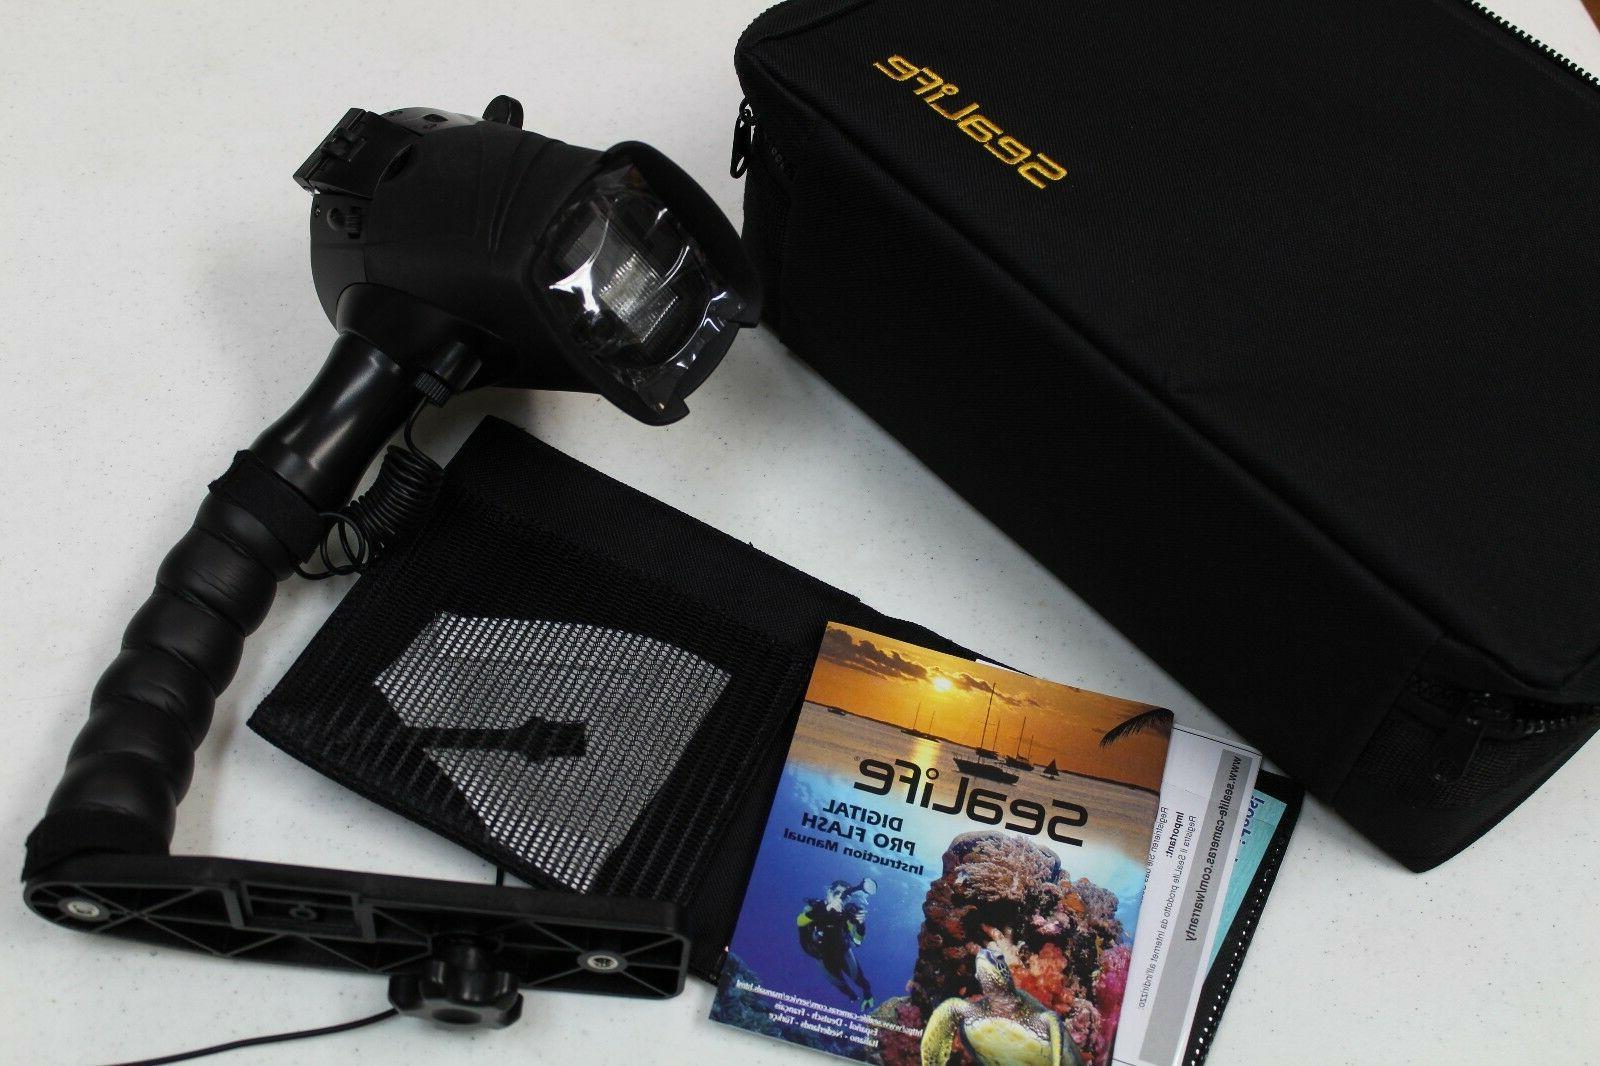 Sealife DC1400 Underwater Camera Strobe and Case